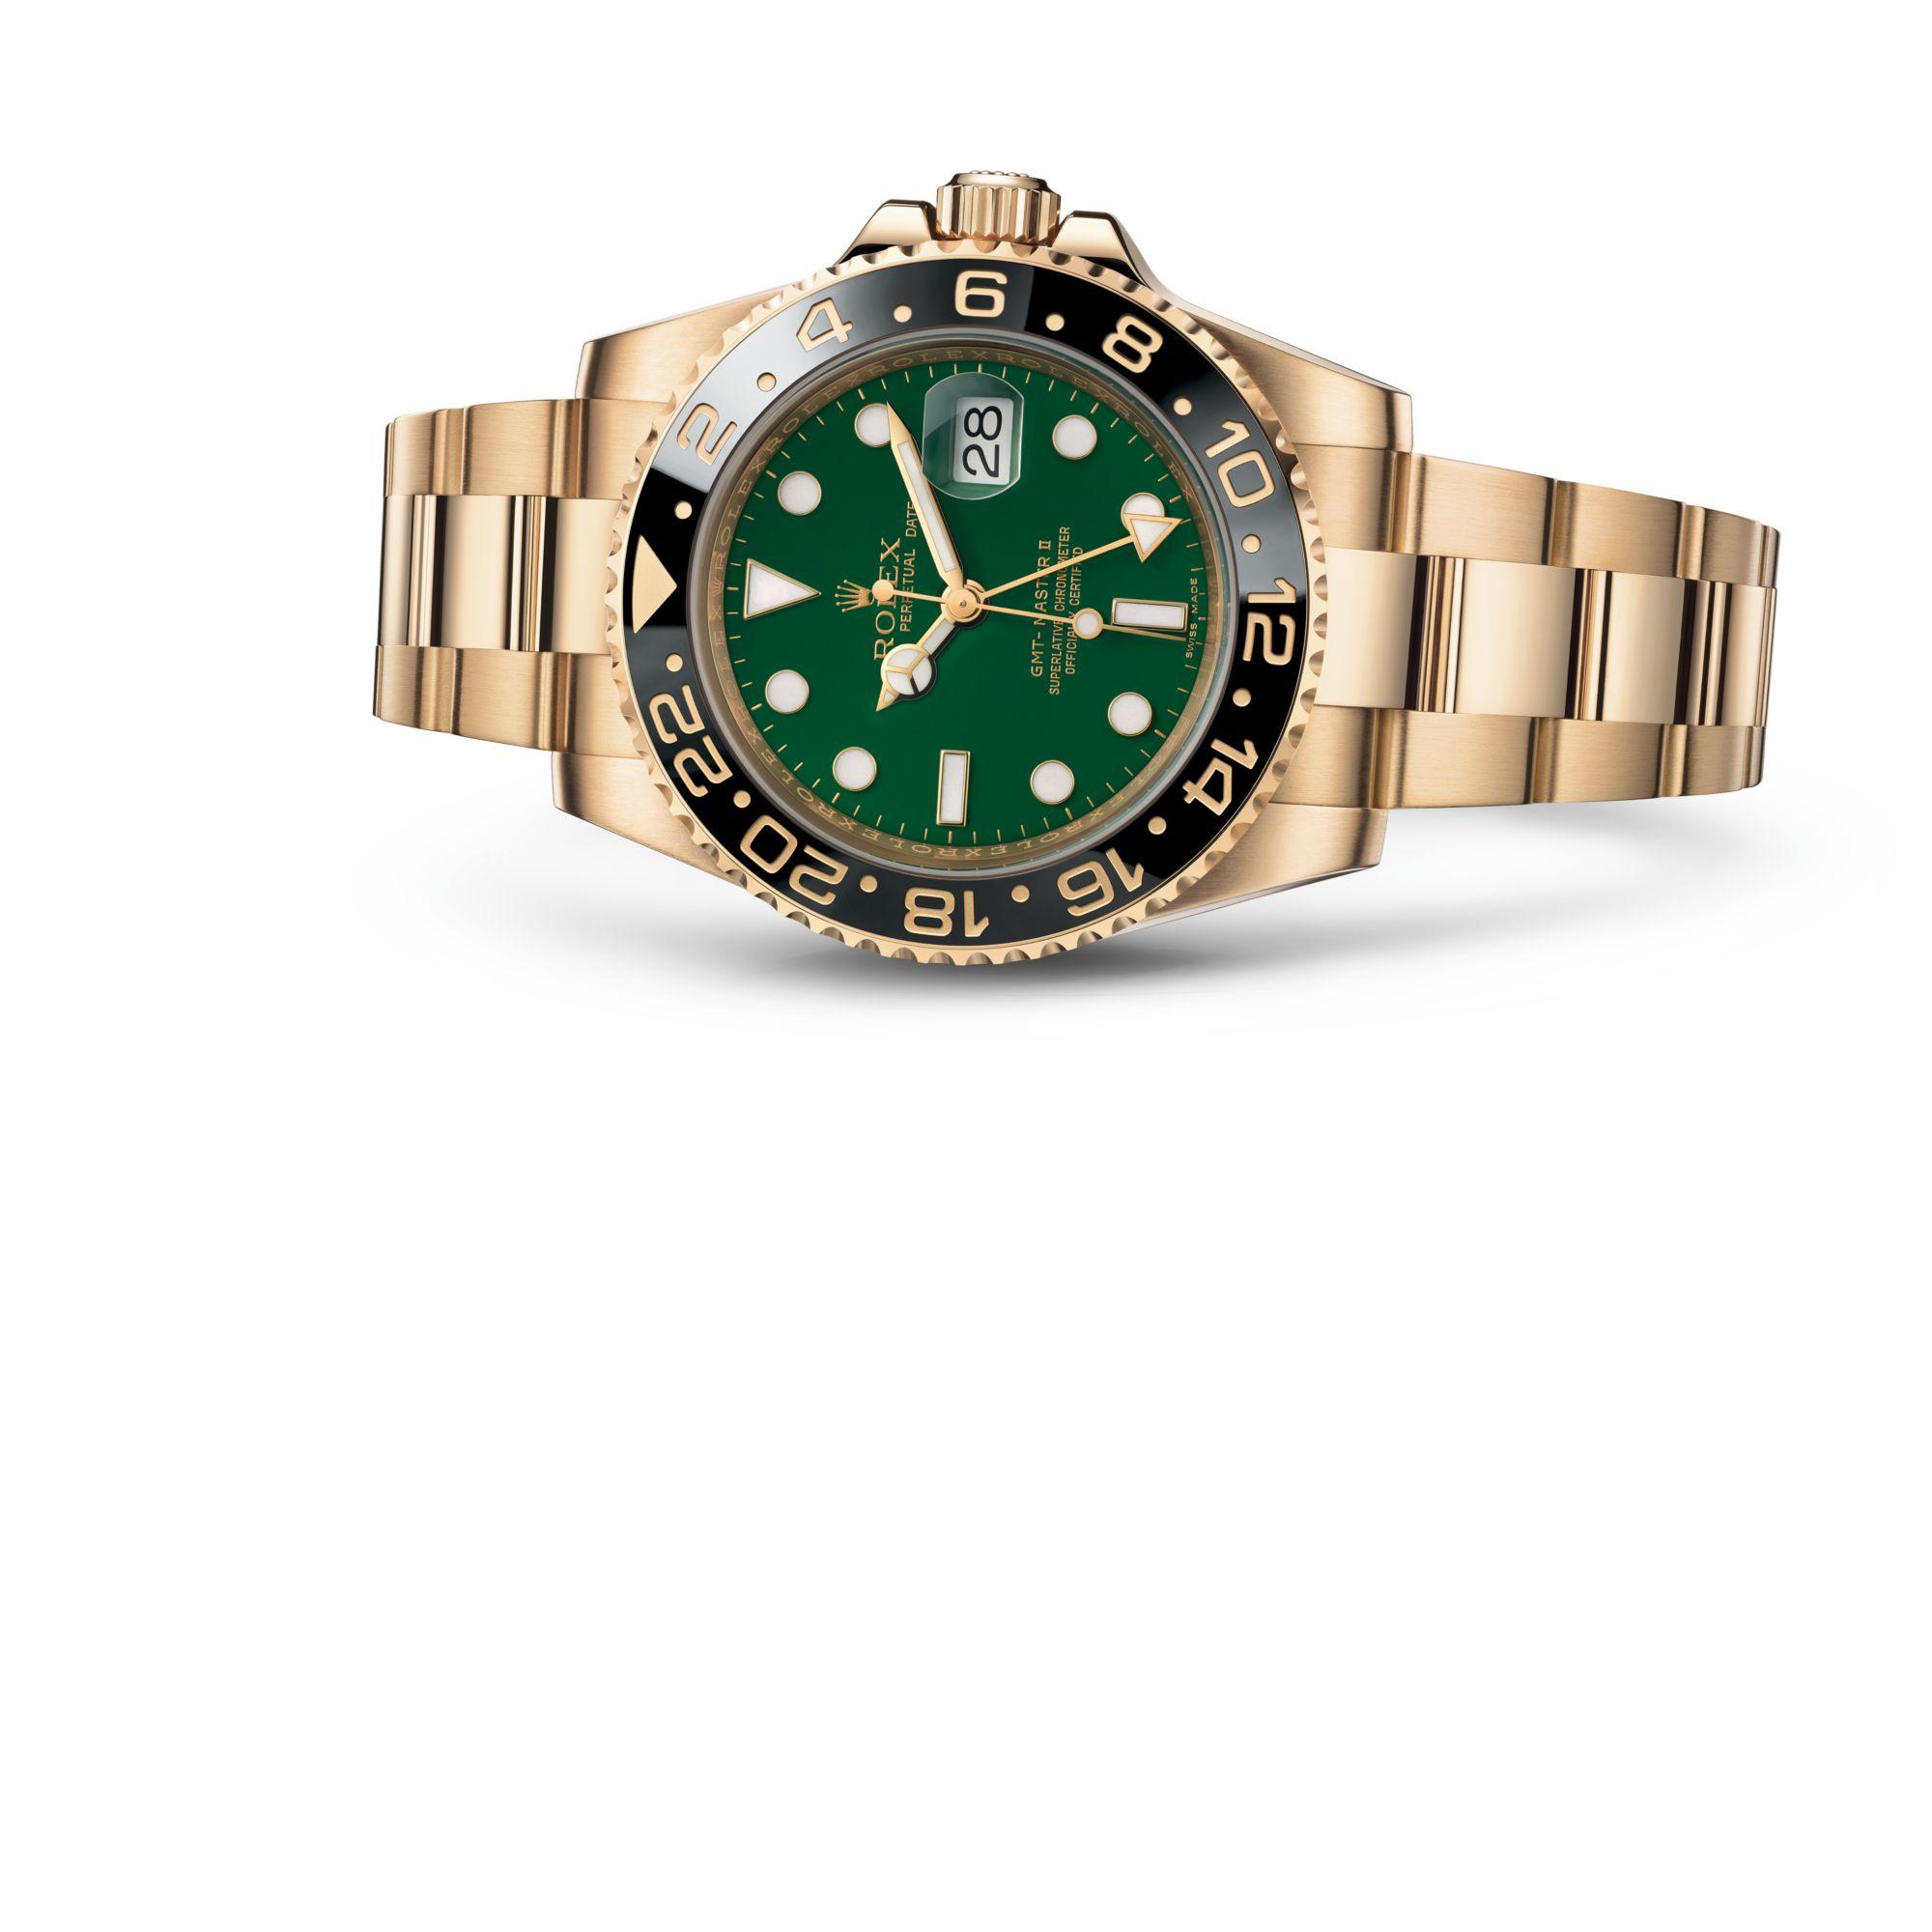 Rolex GMT-Master II M116718LN-0002